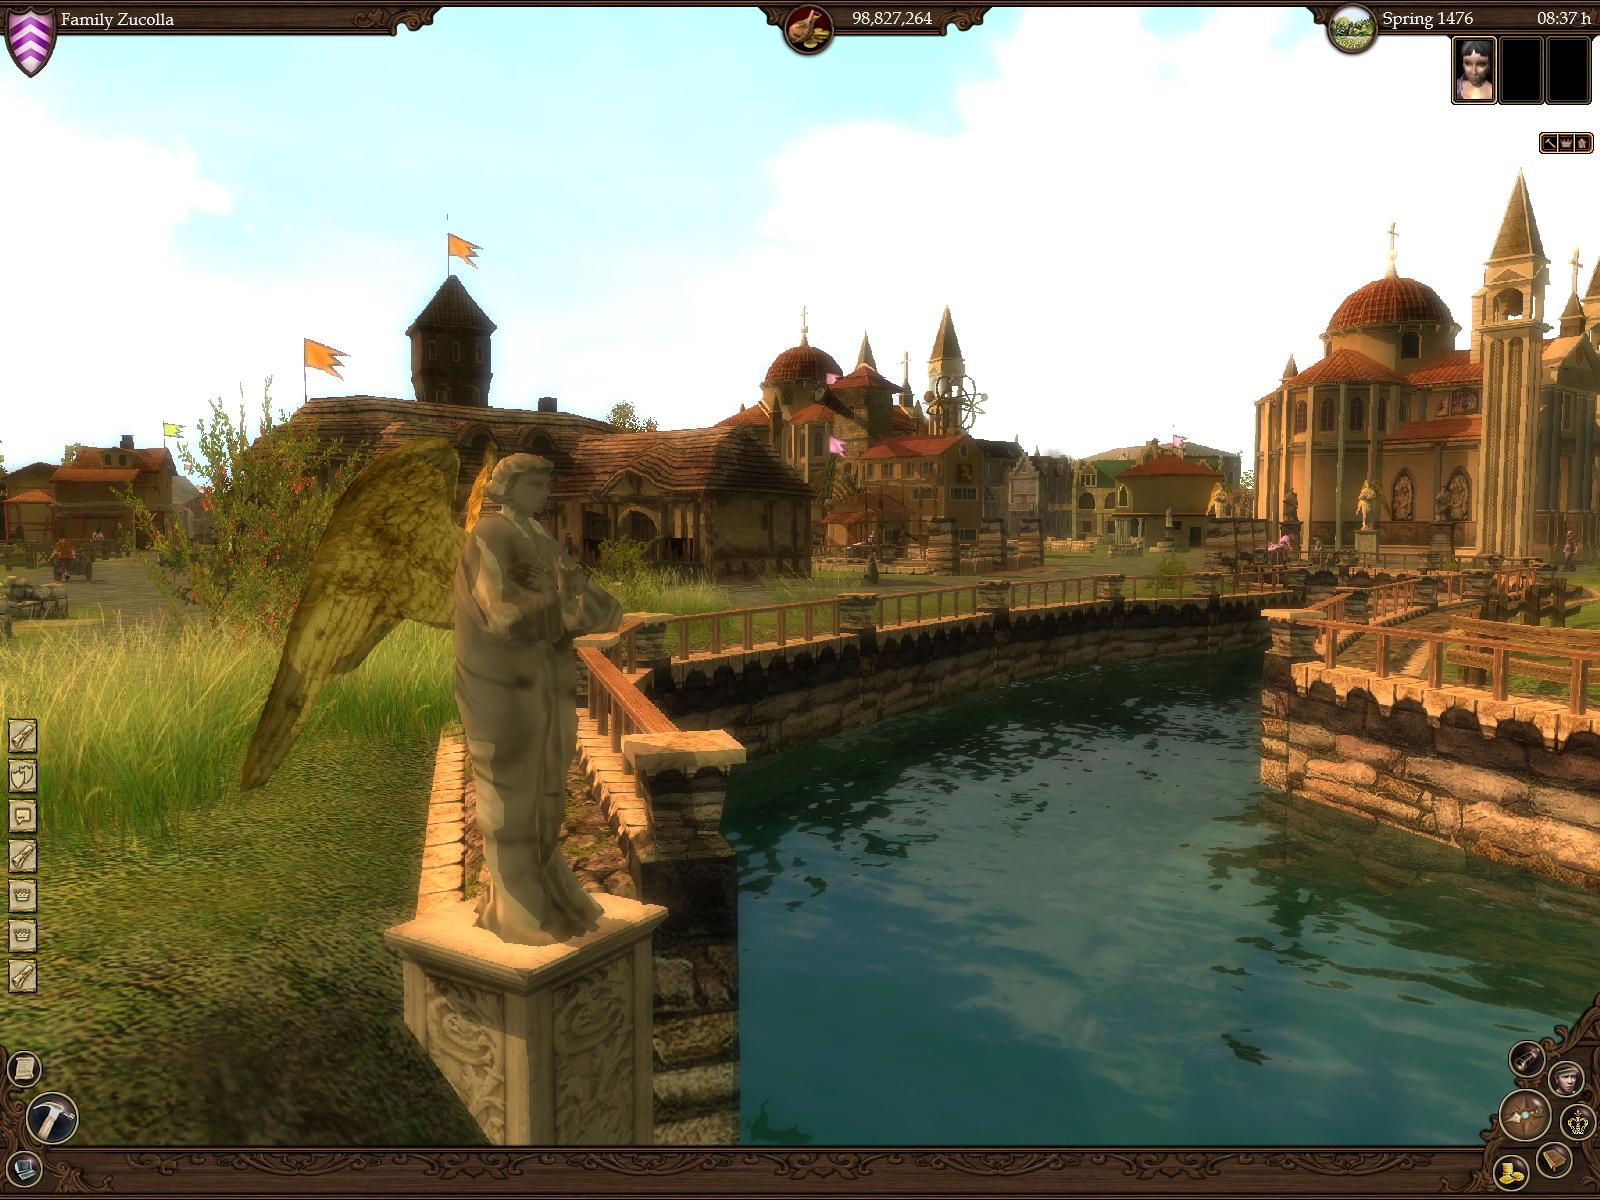 The Guild II screenshot